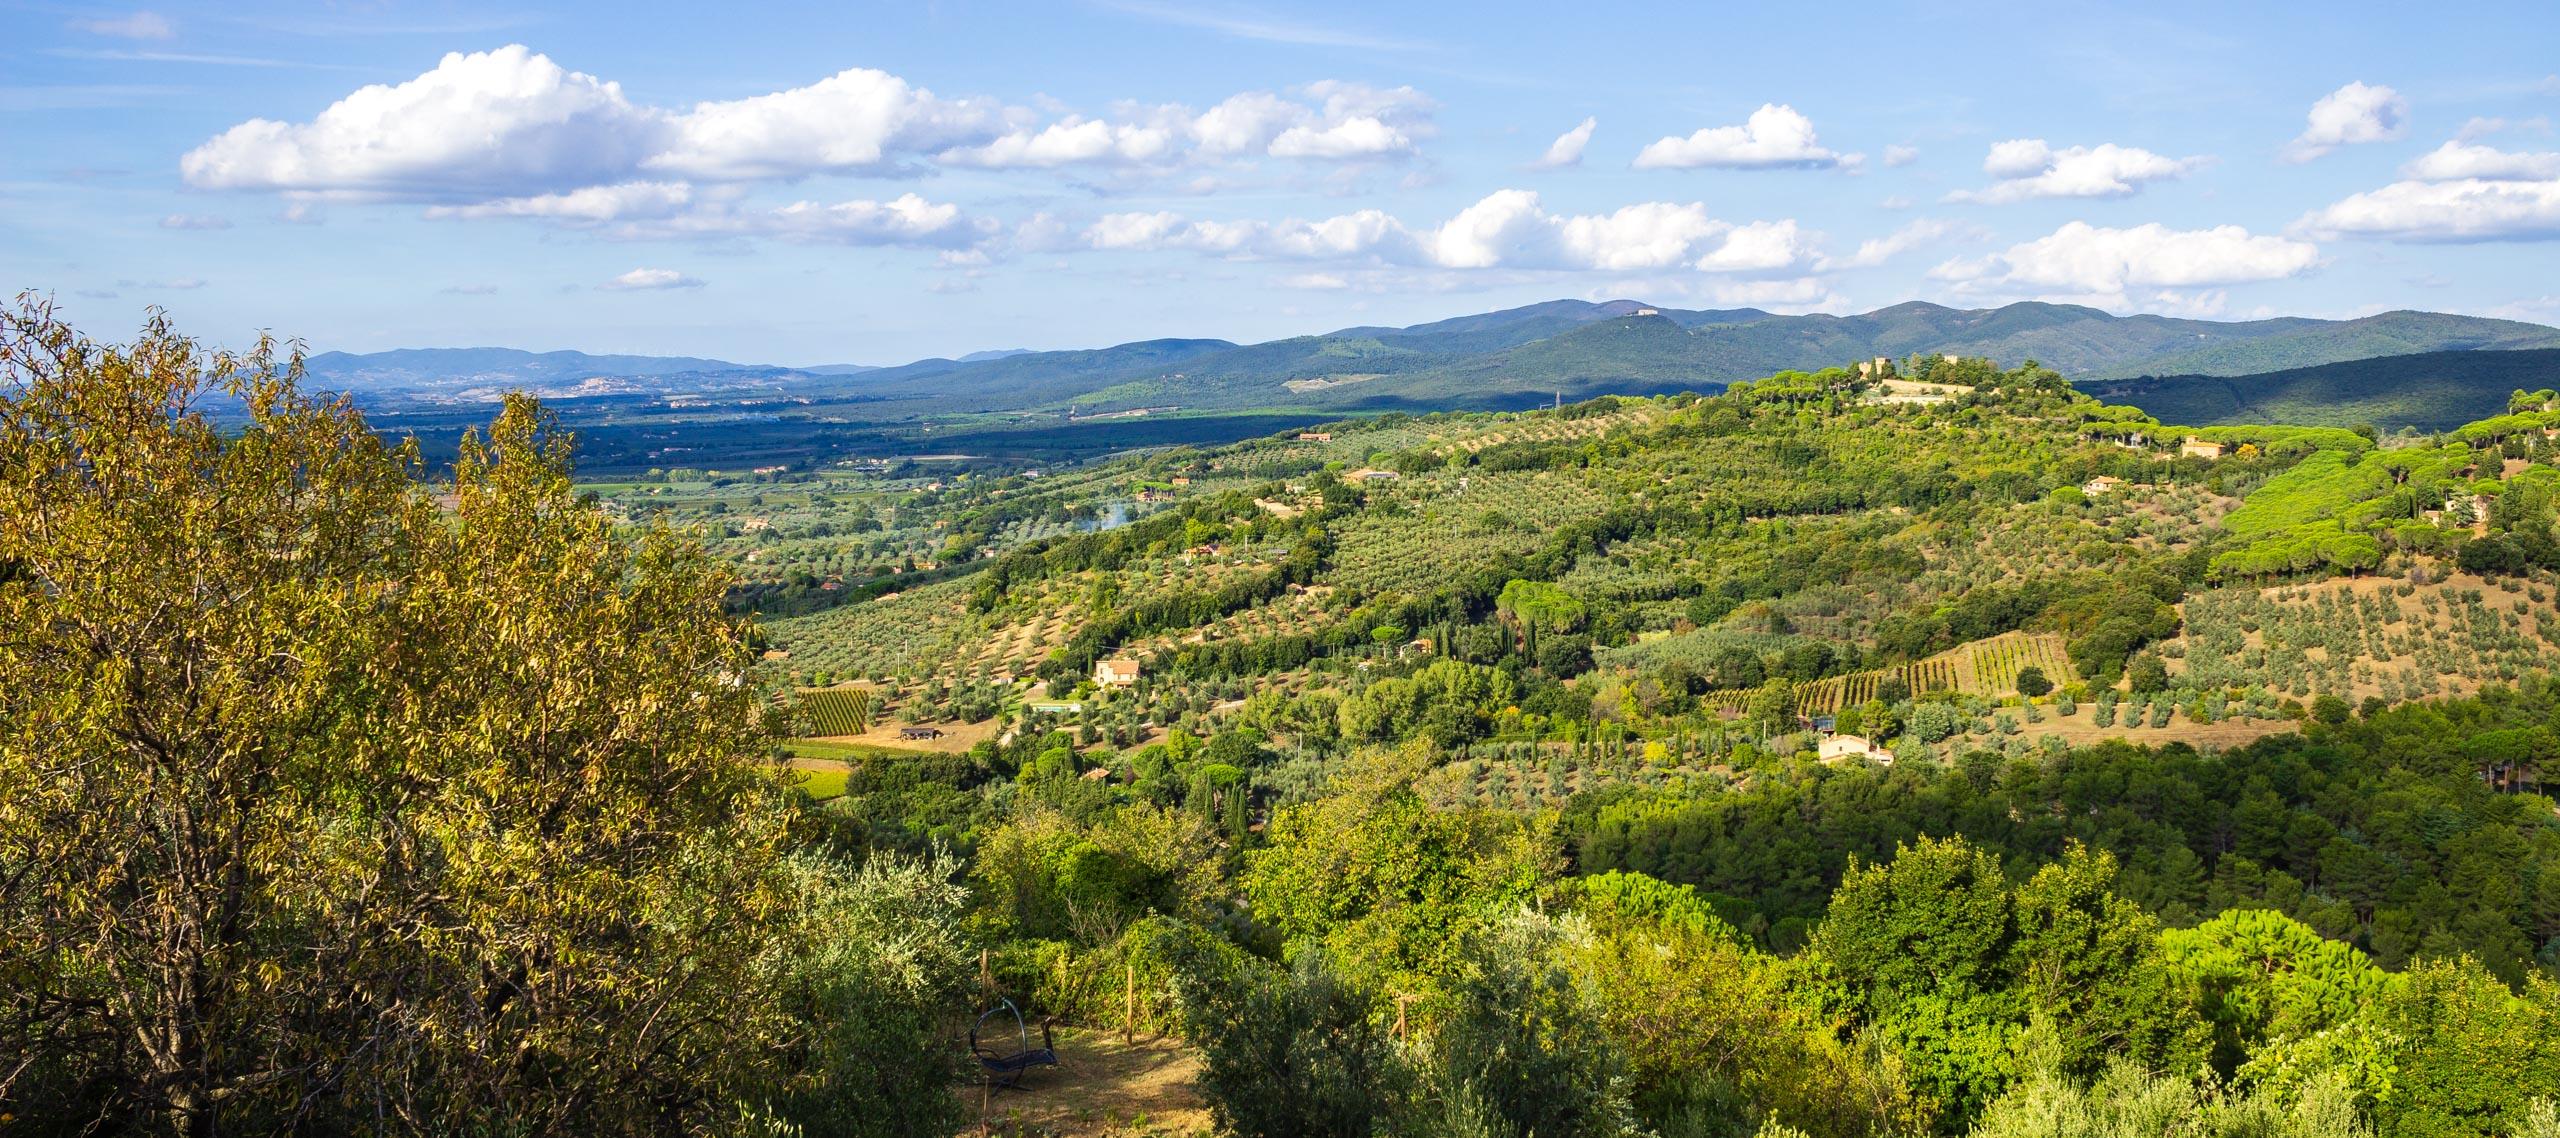 2013 10 Tuscany Panorama 001